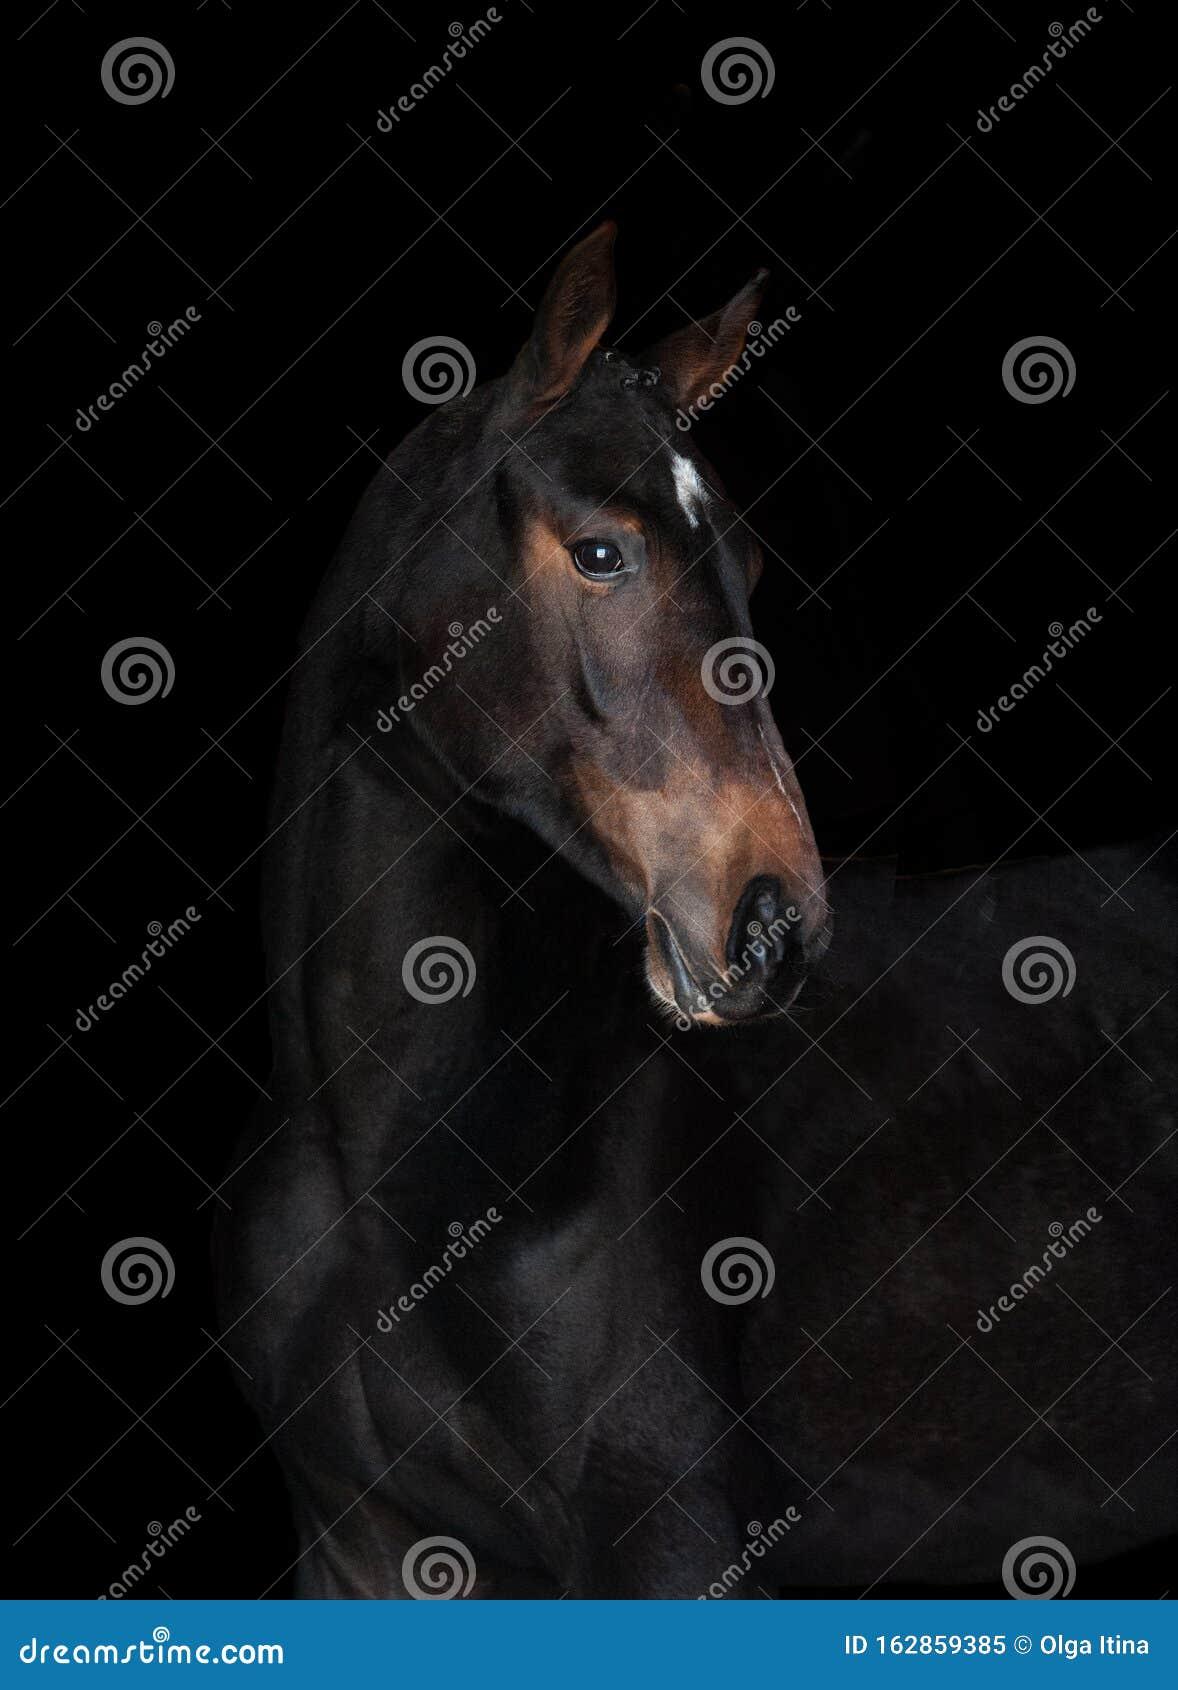 1 329 Closeup Portrait Black Horse Dark Photos Free Royalty Free Stock Photos From Dreamstime